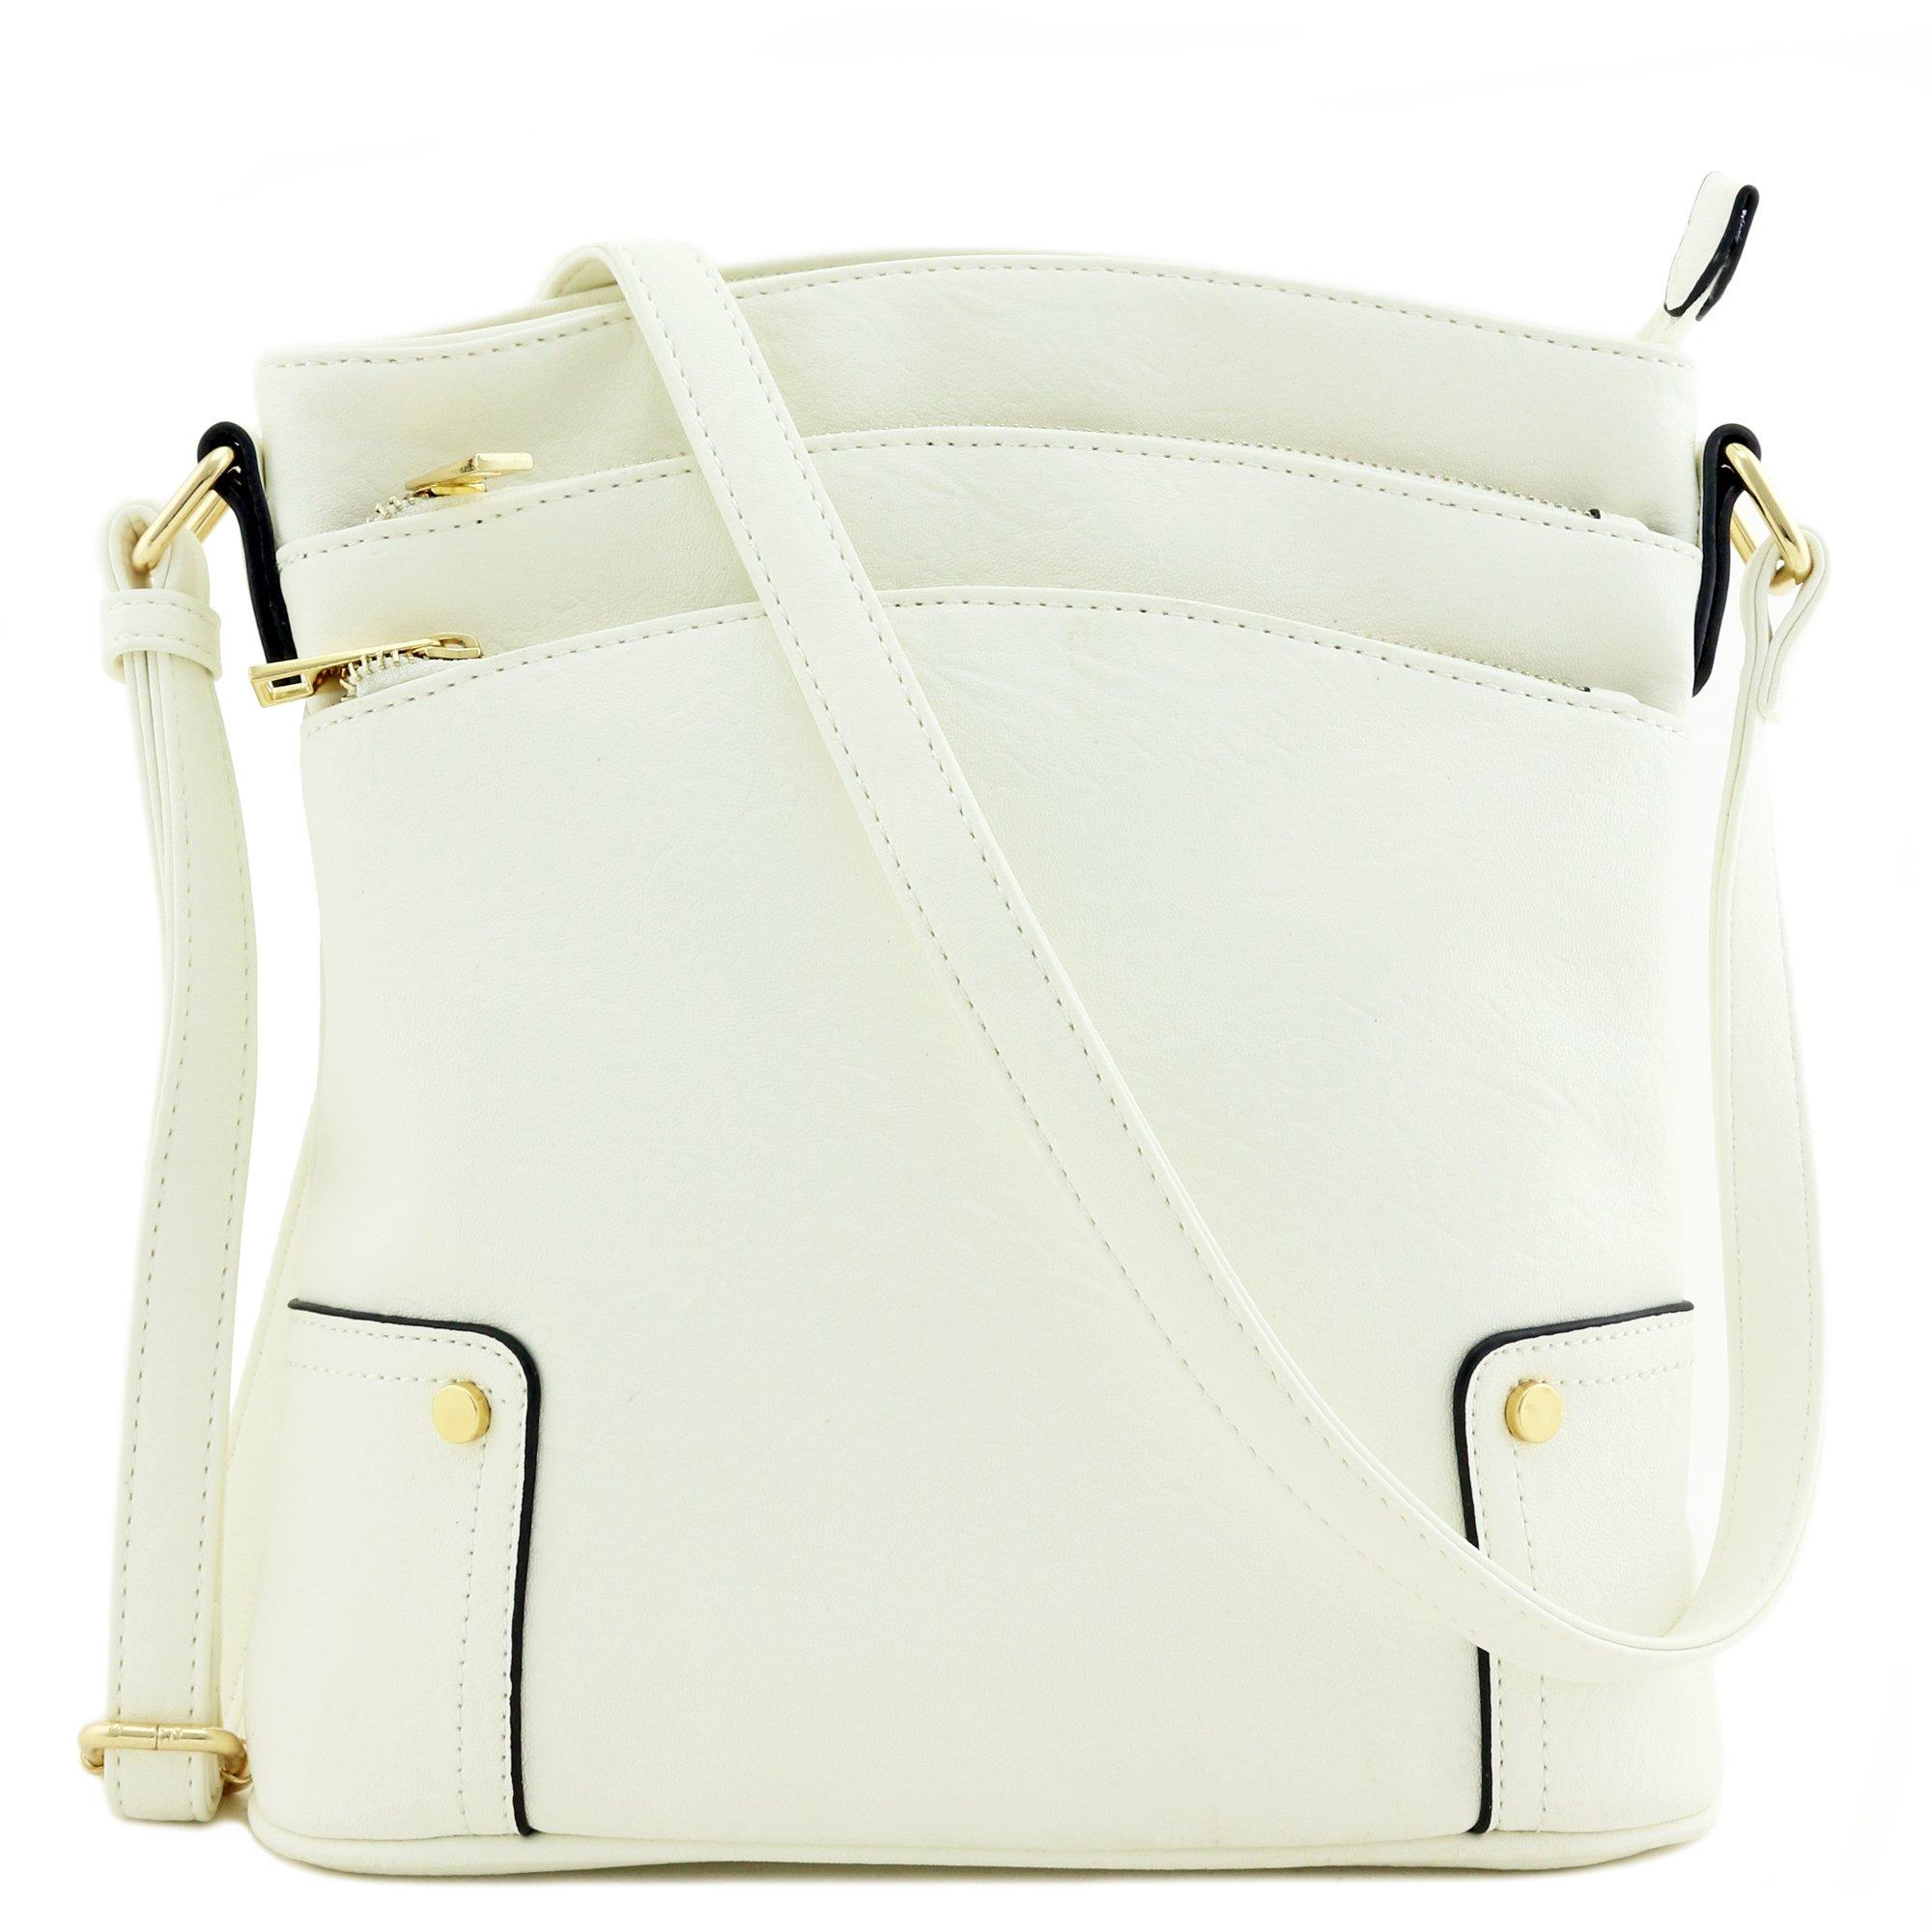 Triple Zip Pocket Large Crossbody Bag (White) by Alyssa